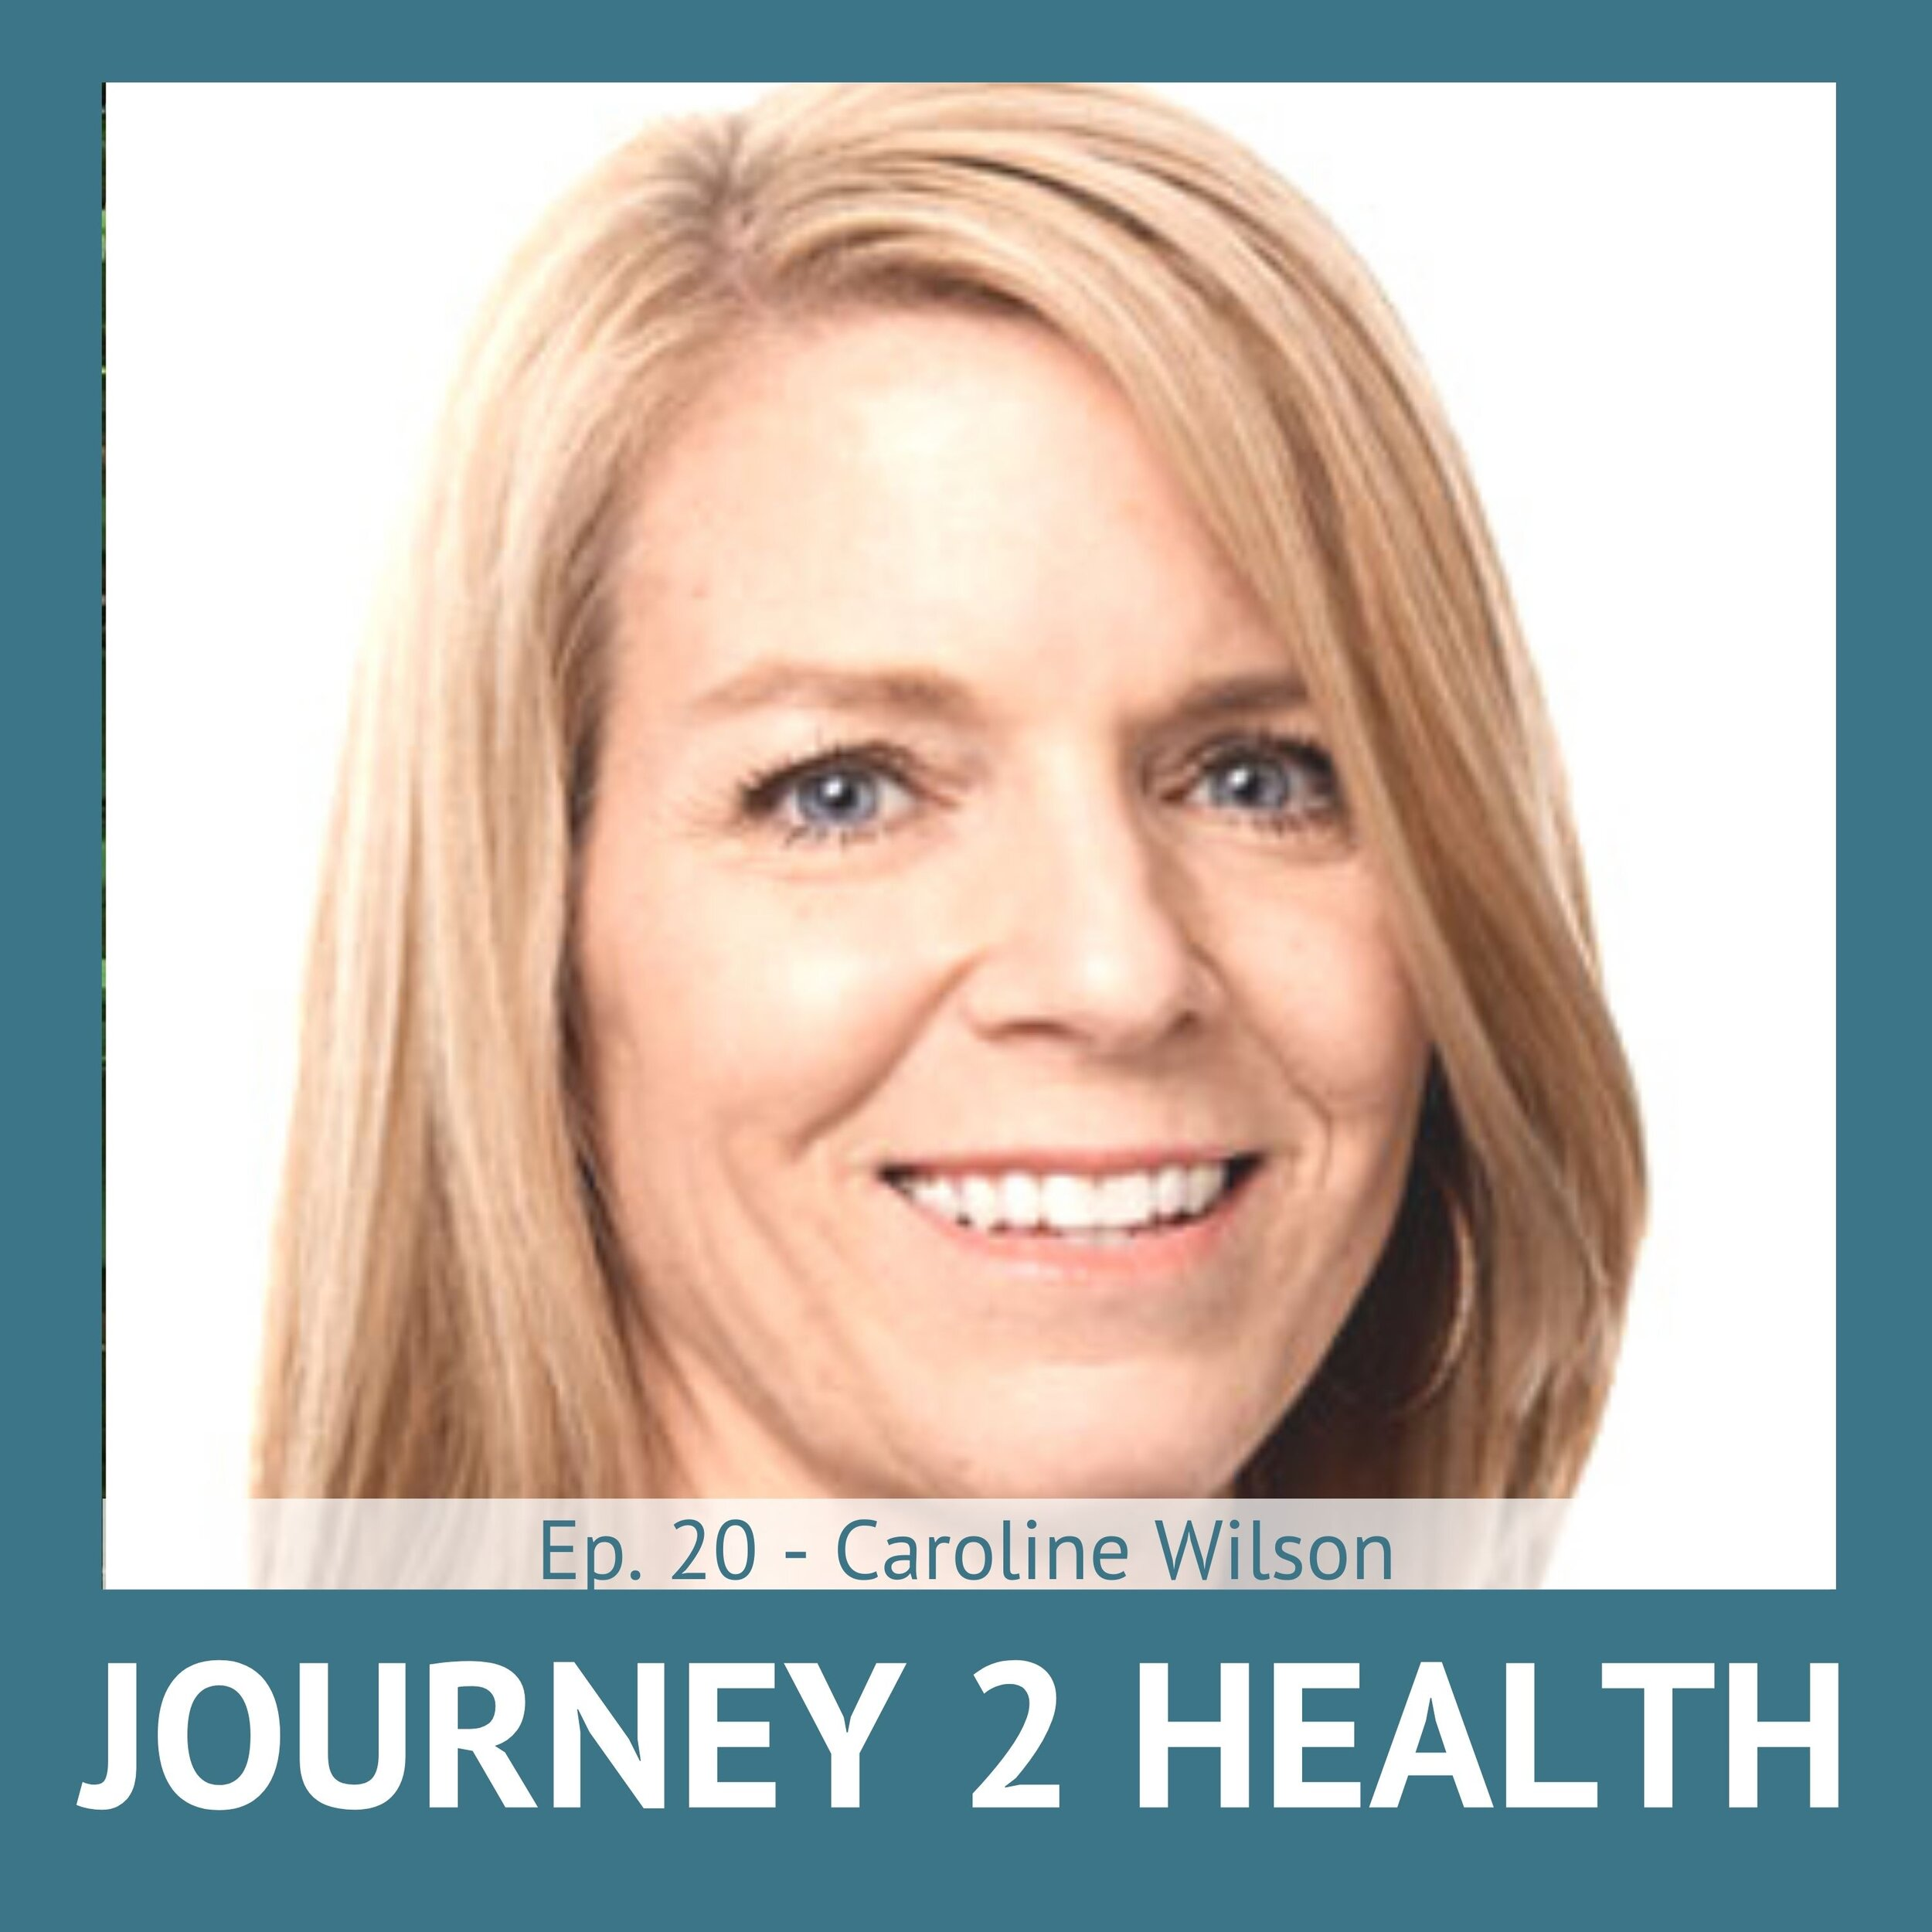 Ep #20 - Caroline Wilson